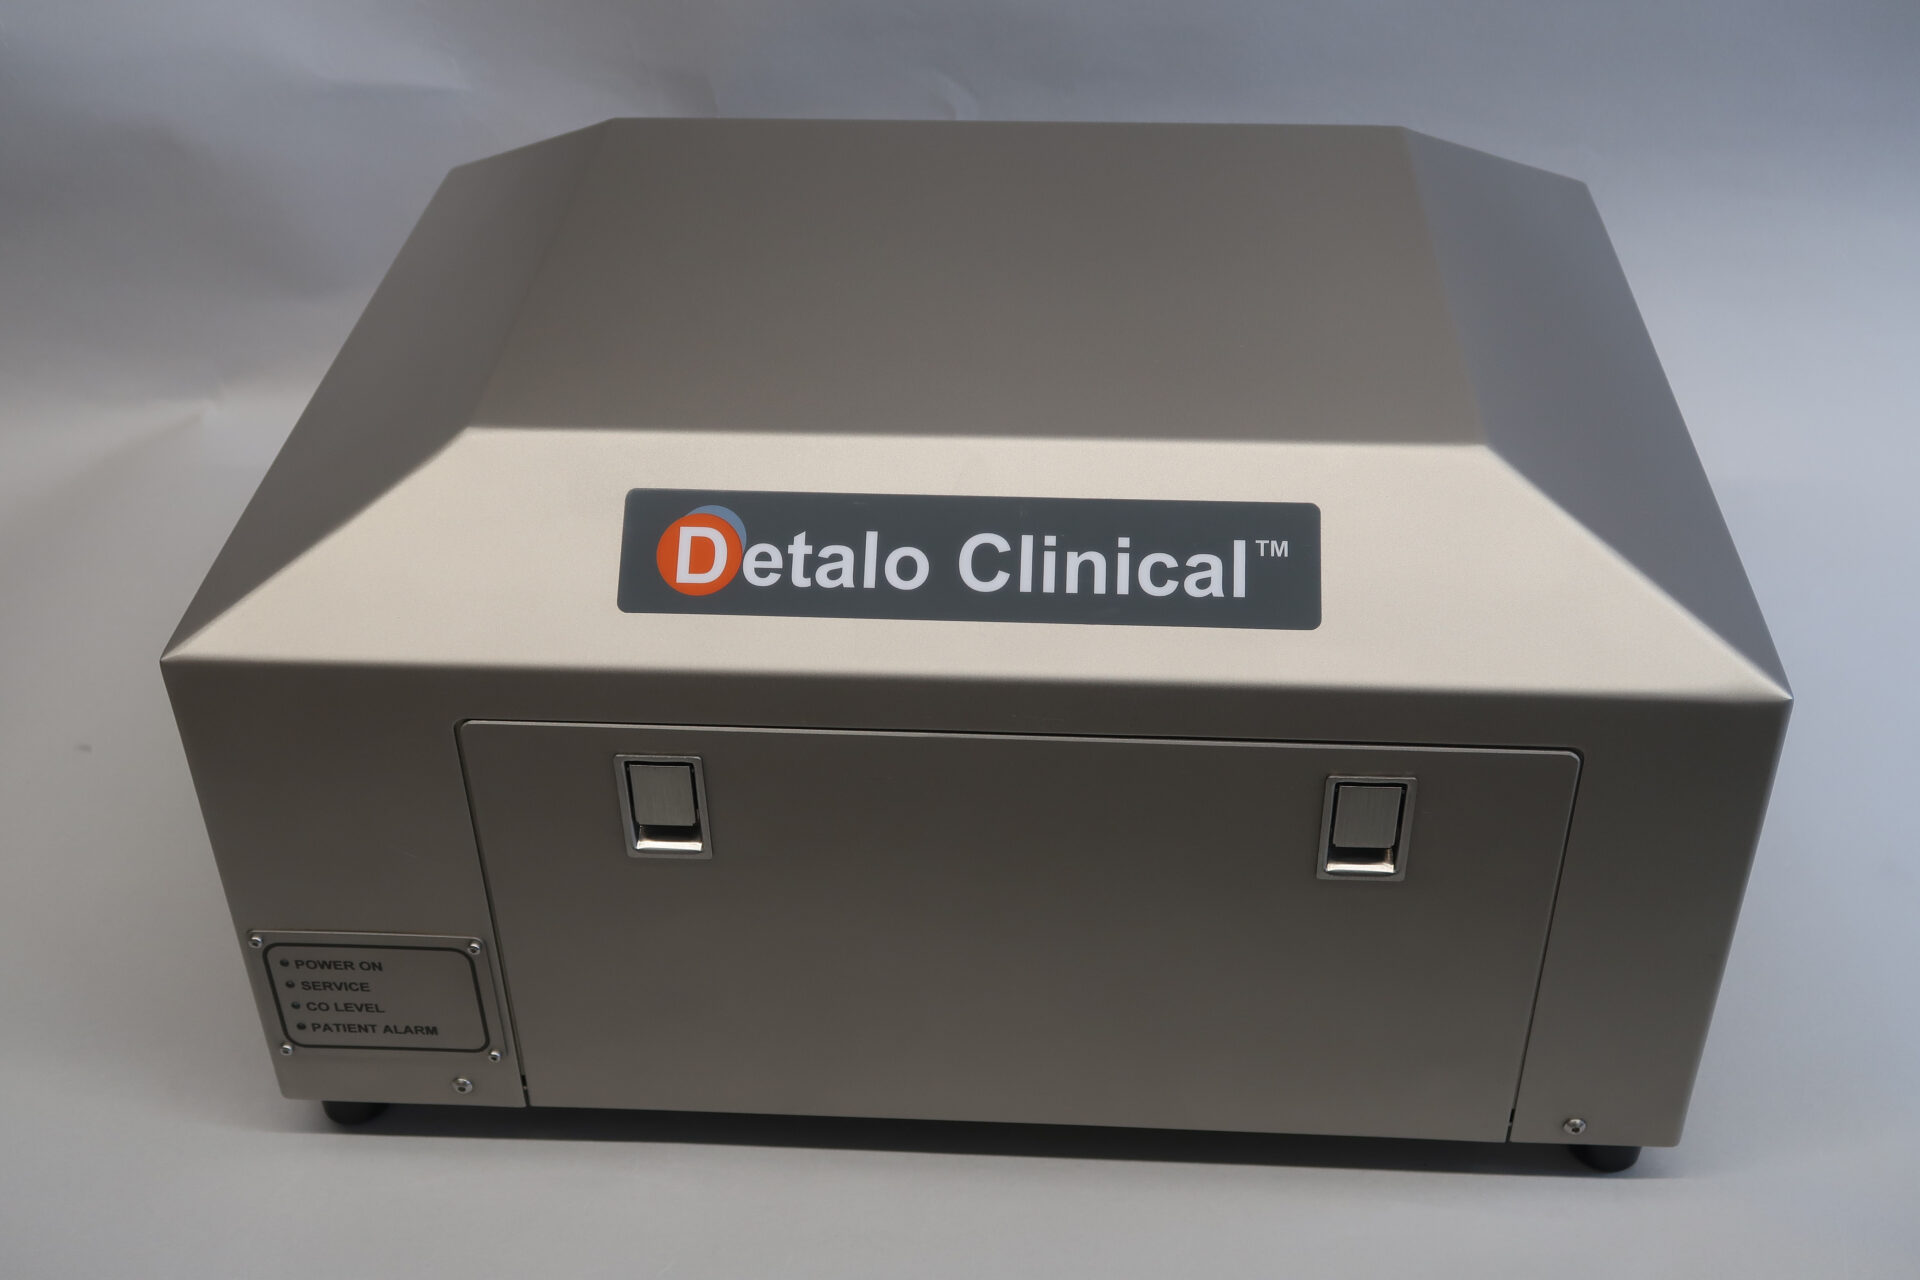 Detalo Clinical Blood Volume Analyser